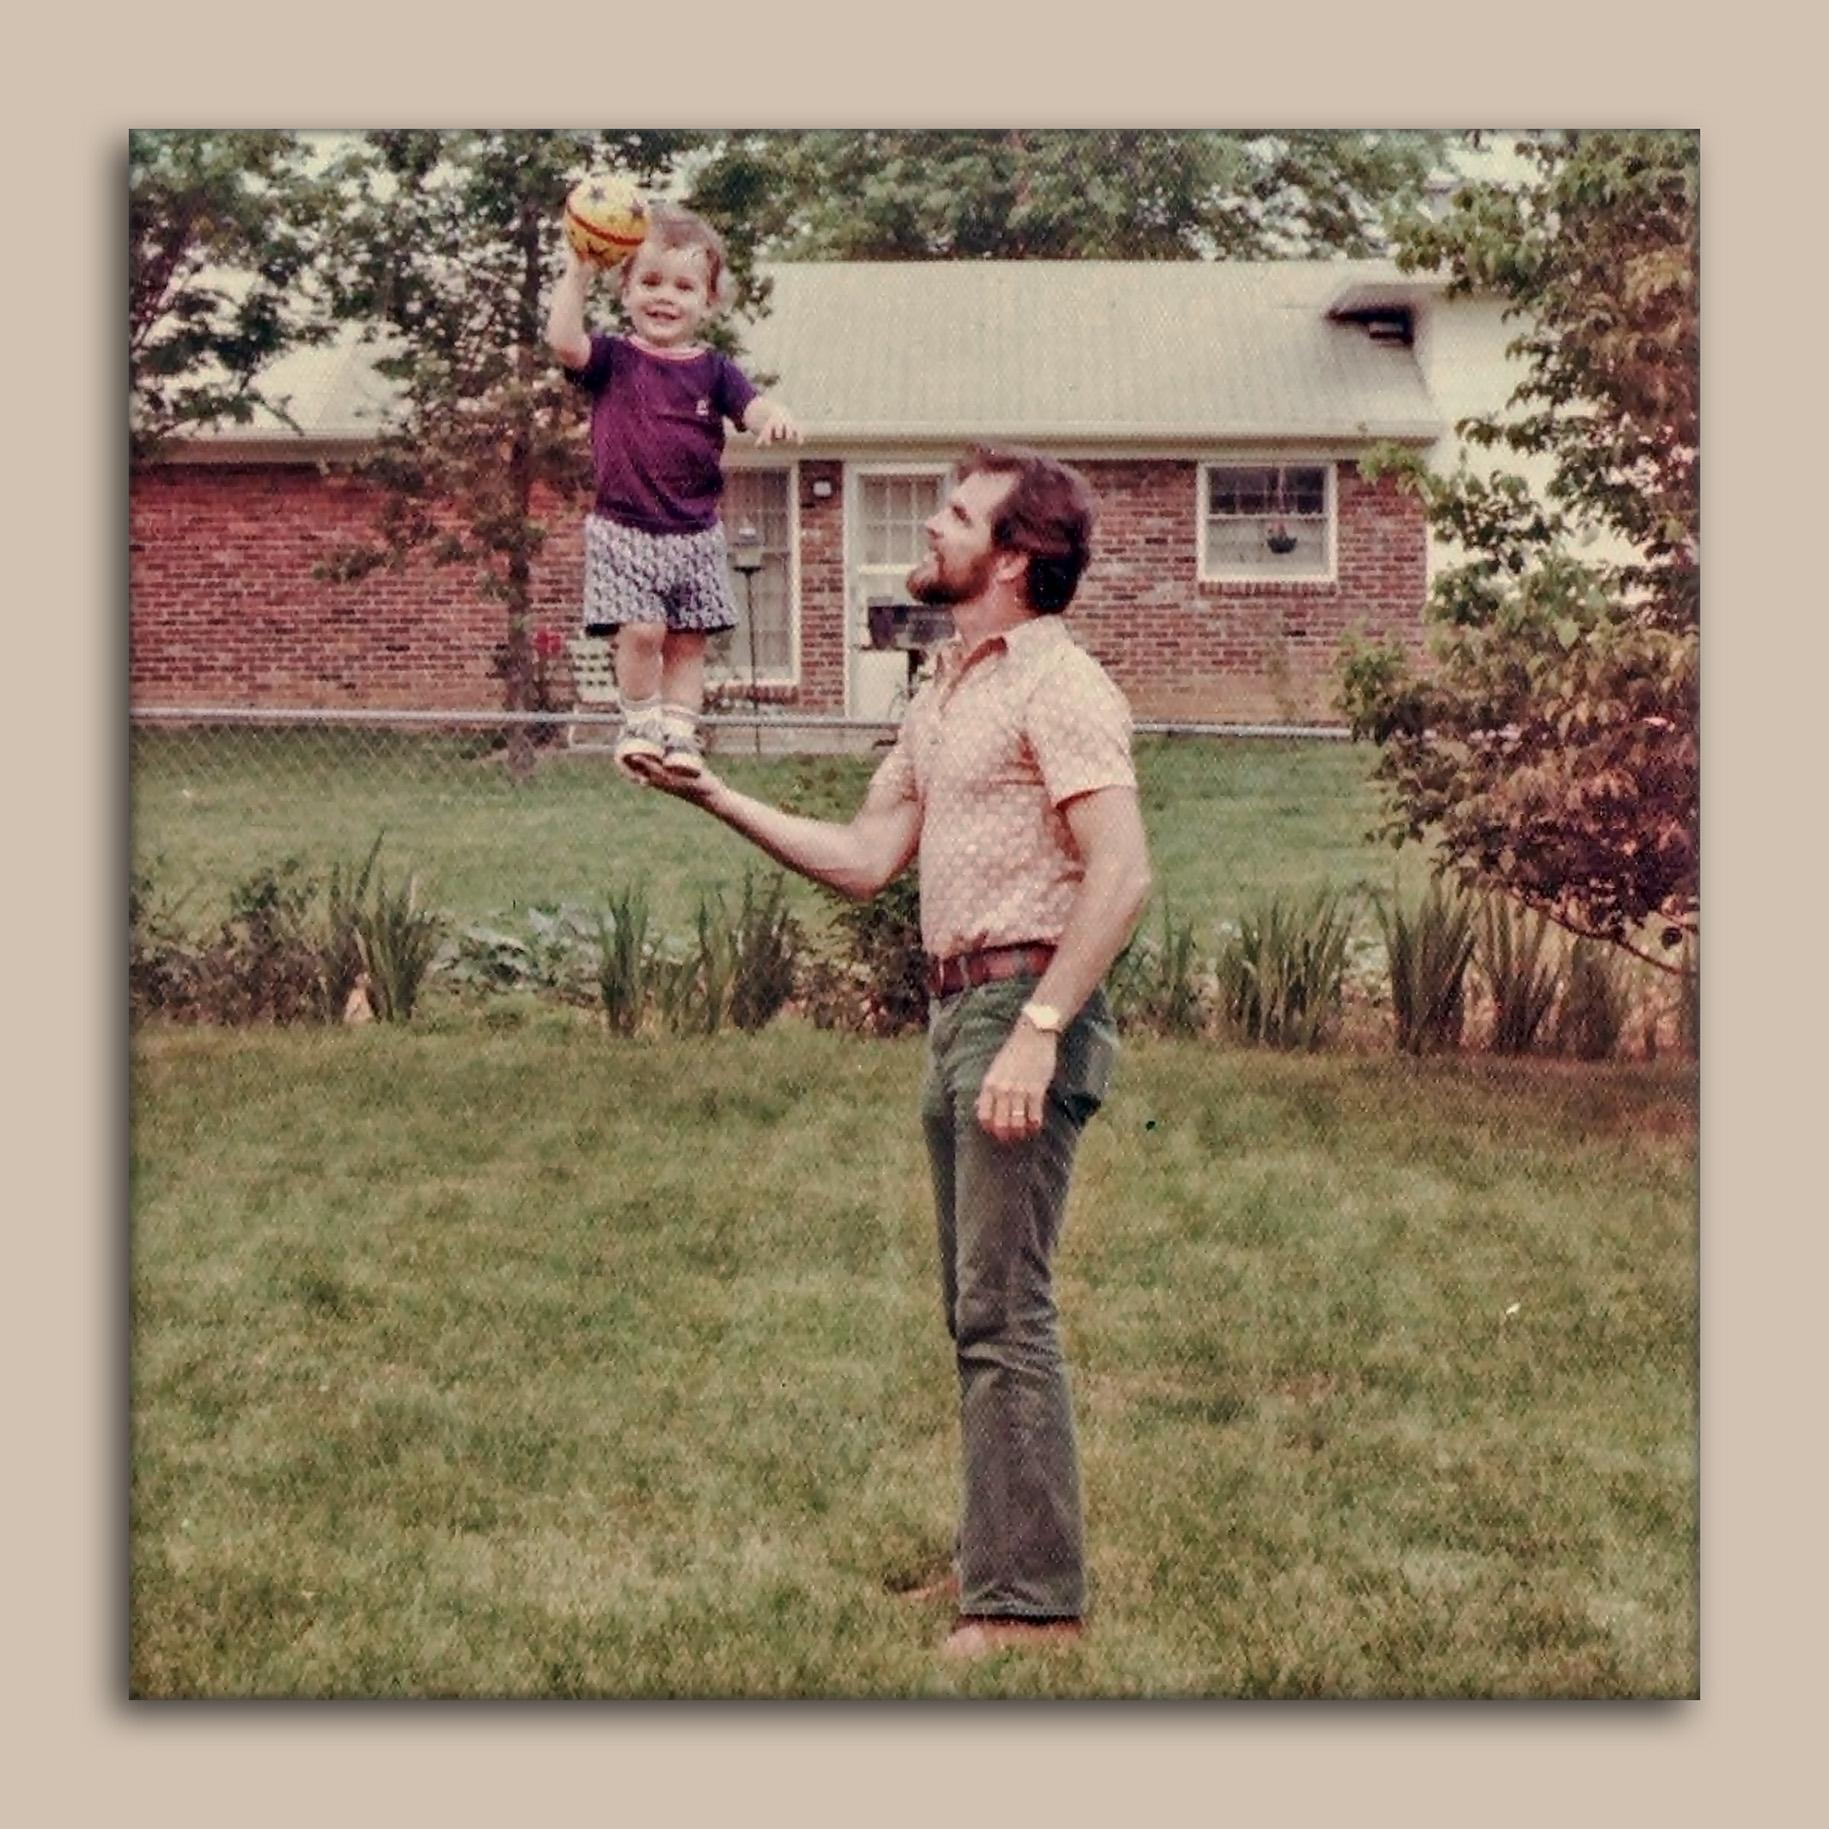 KenneDavid&Dad-2020-72.jpg